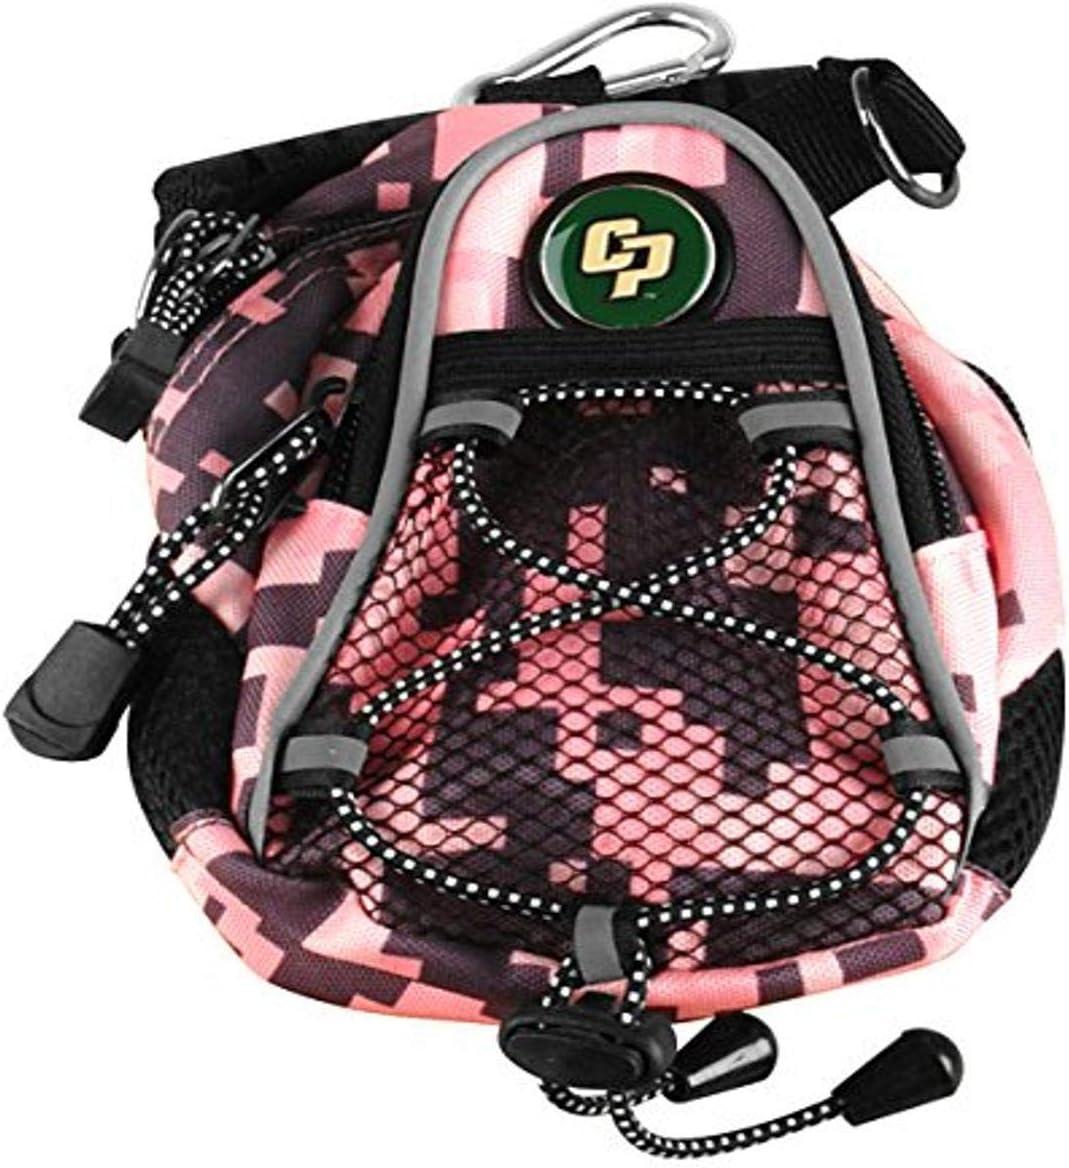 LinksWalker California Polytechnic State University-Mini Day Pack Pink Digi Camo